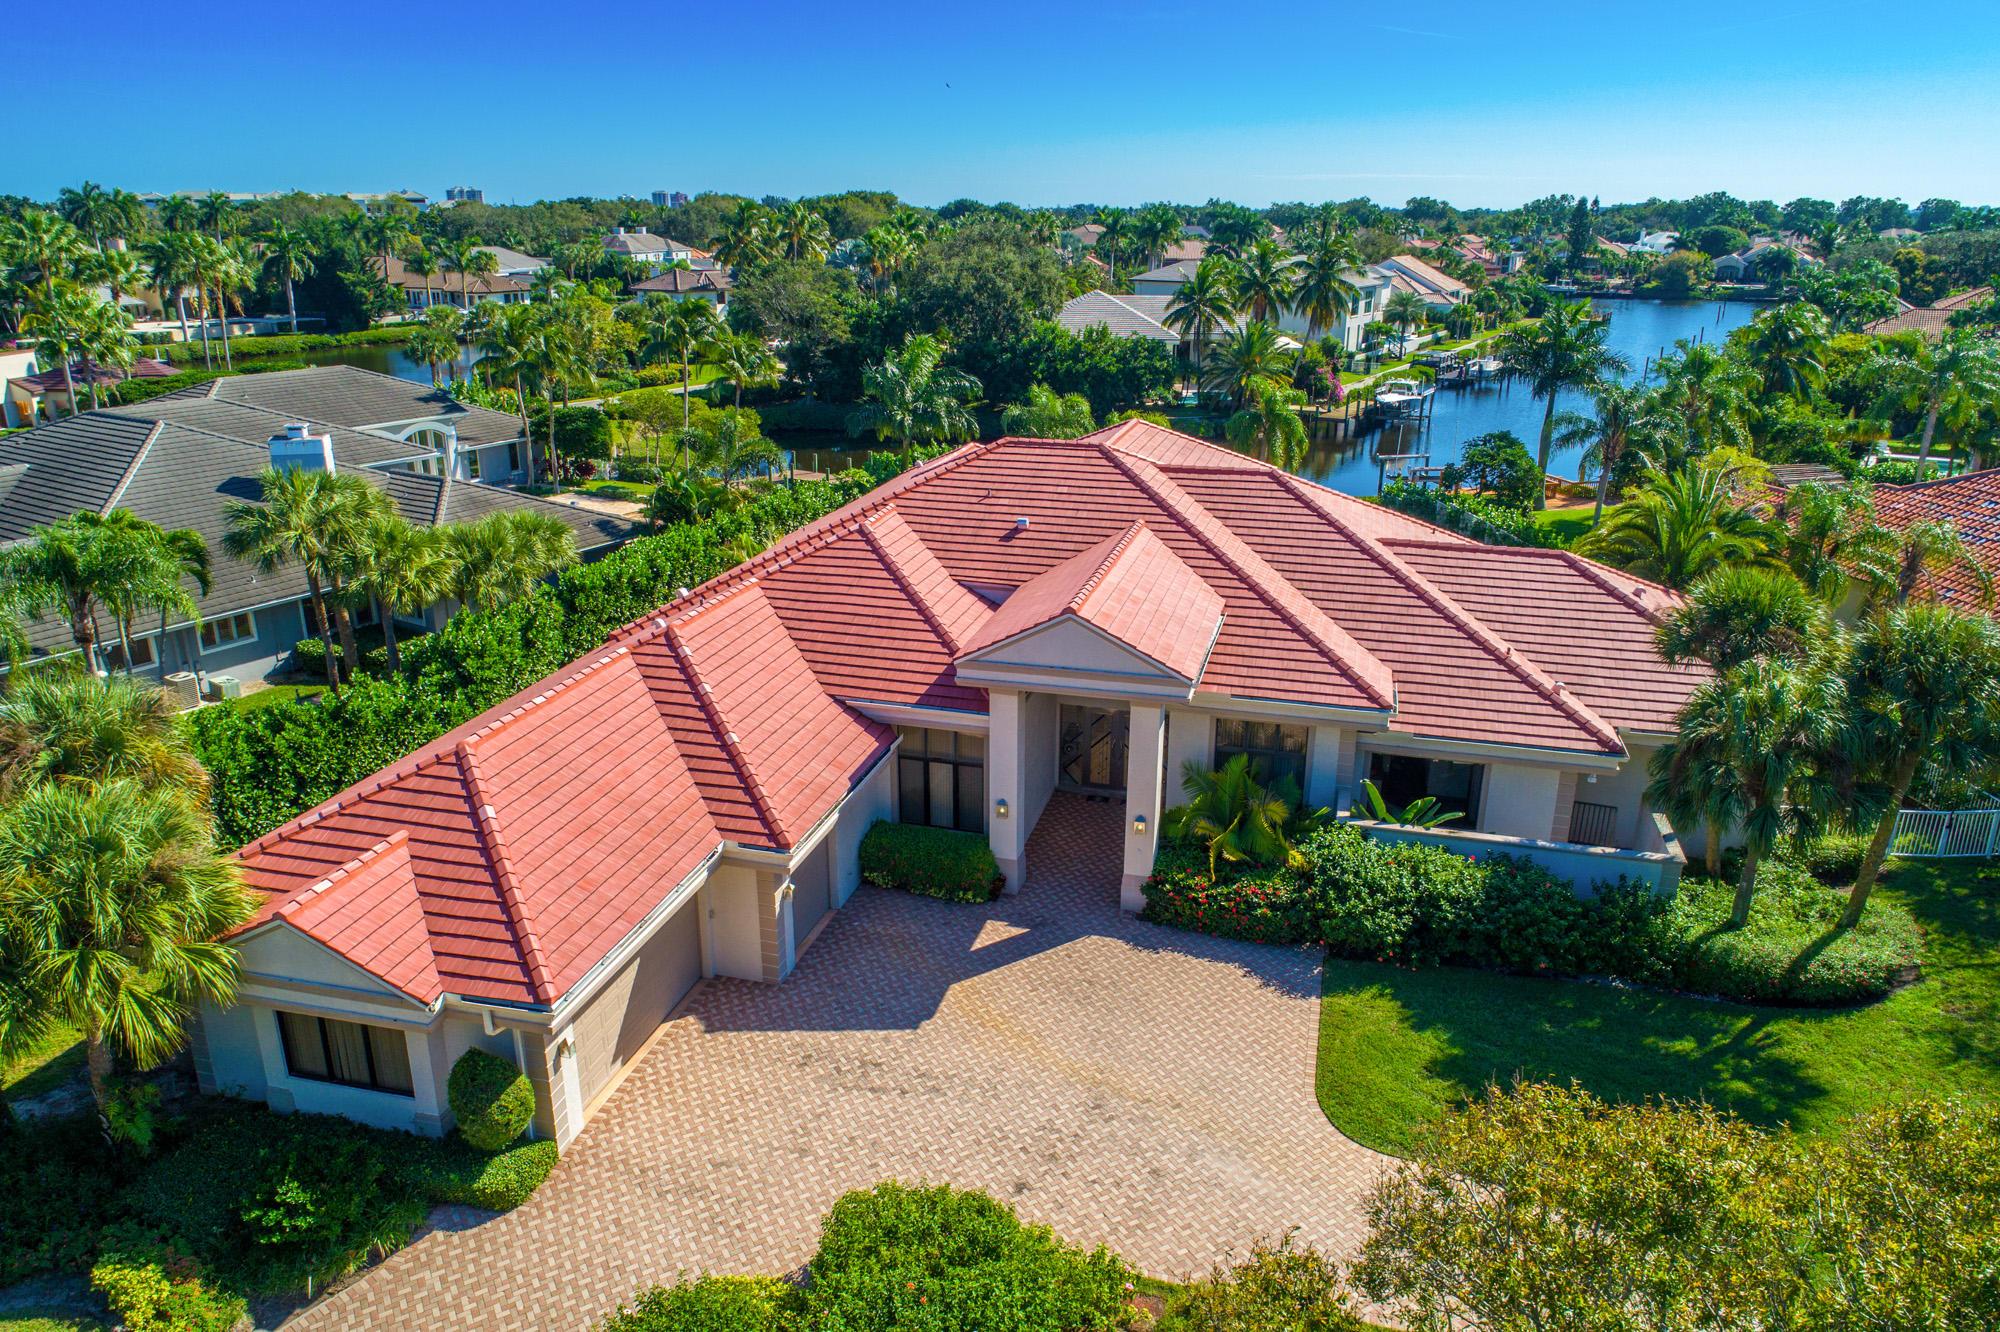 3000 Le Bateau Drive, Palm Beach Gardens, Florida 33410, 4 Bedrooms Bedrooms, ,4.1 BathroomsBathrooms,A,Single family,Le Bateau,RX-10588970